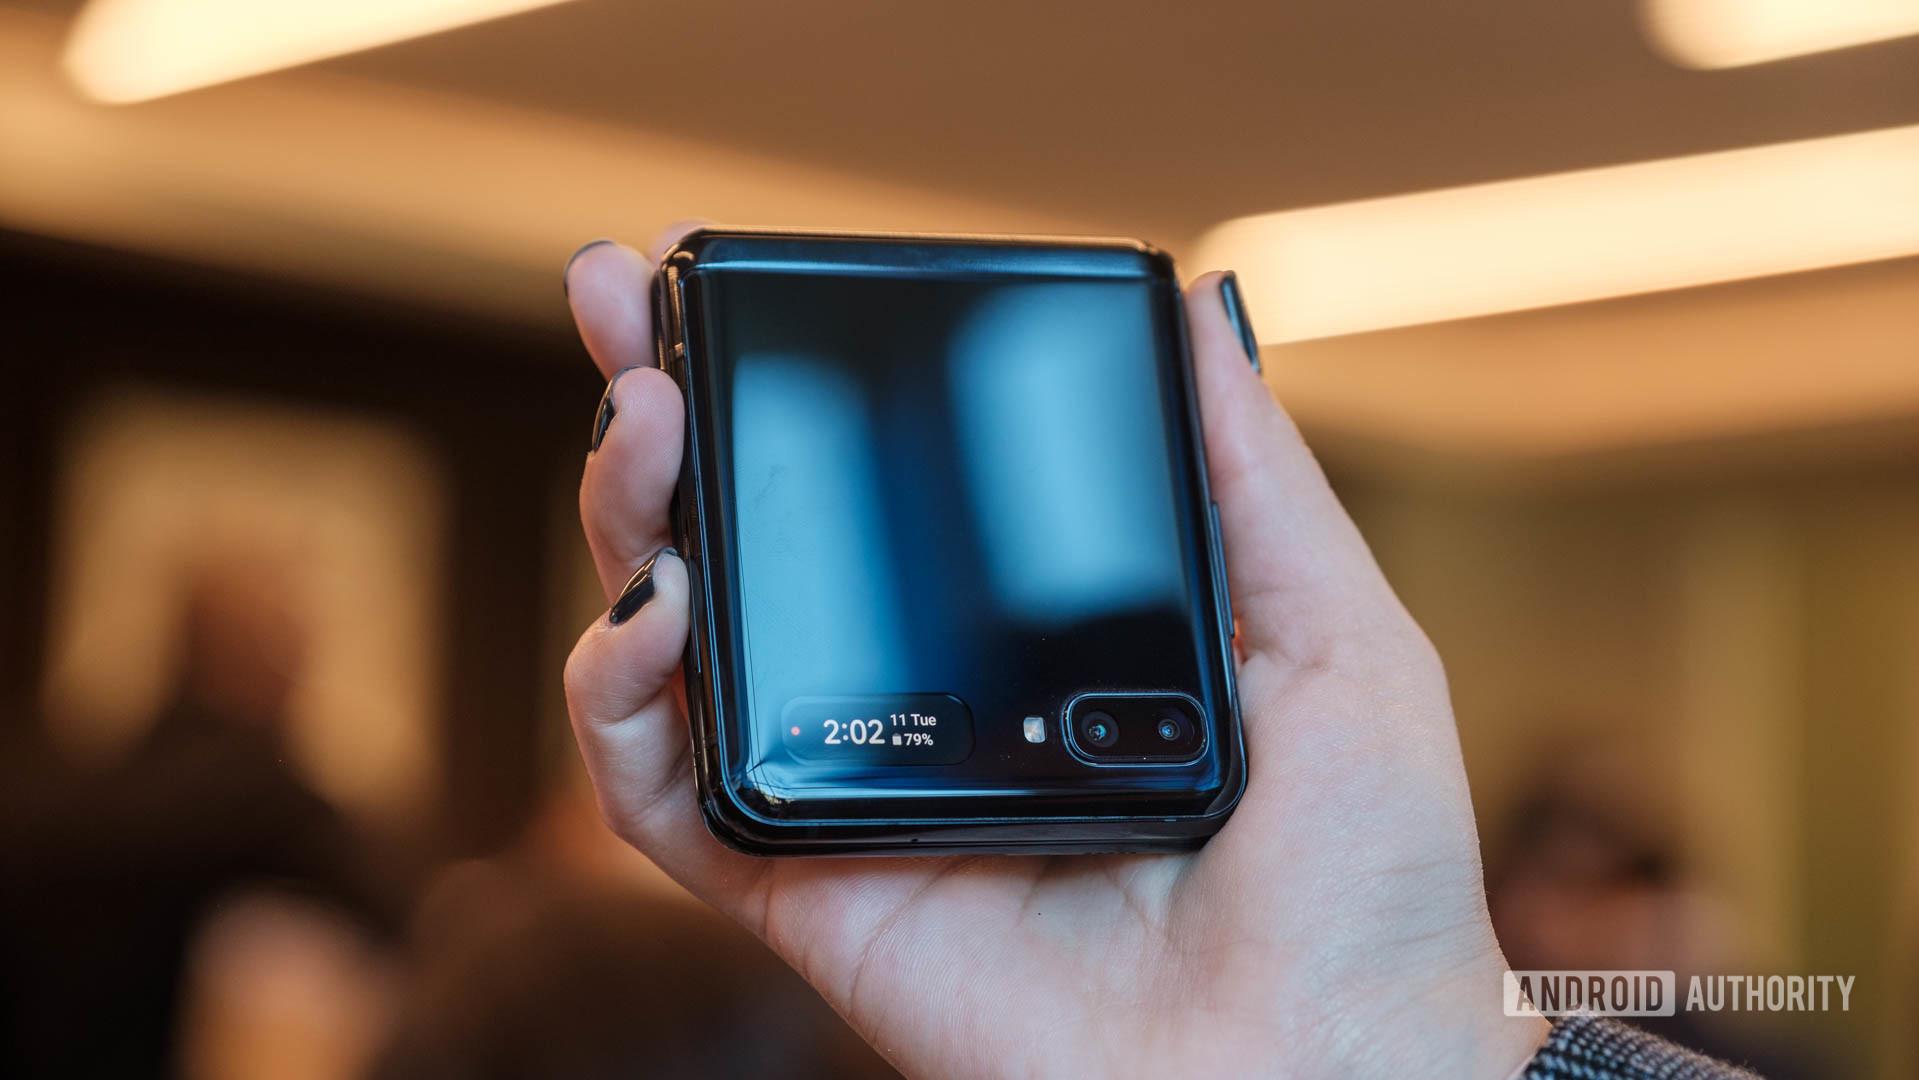 Samsung Galaxy Z Flip hands on half folded in hand 2